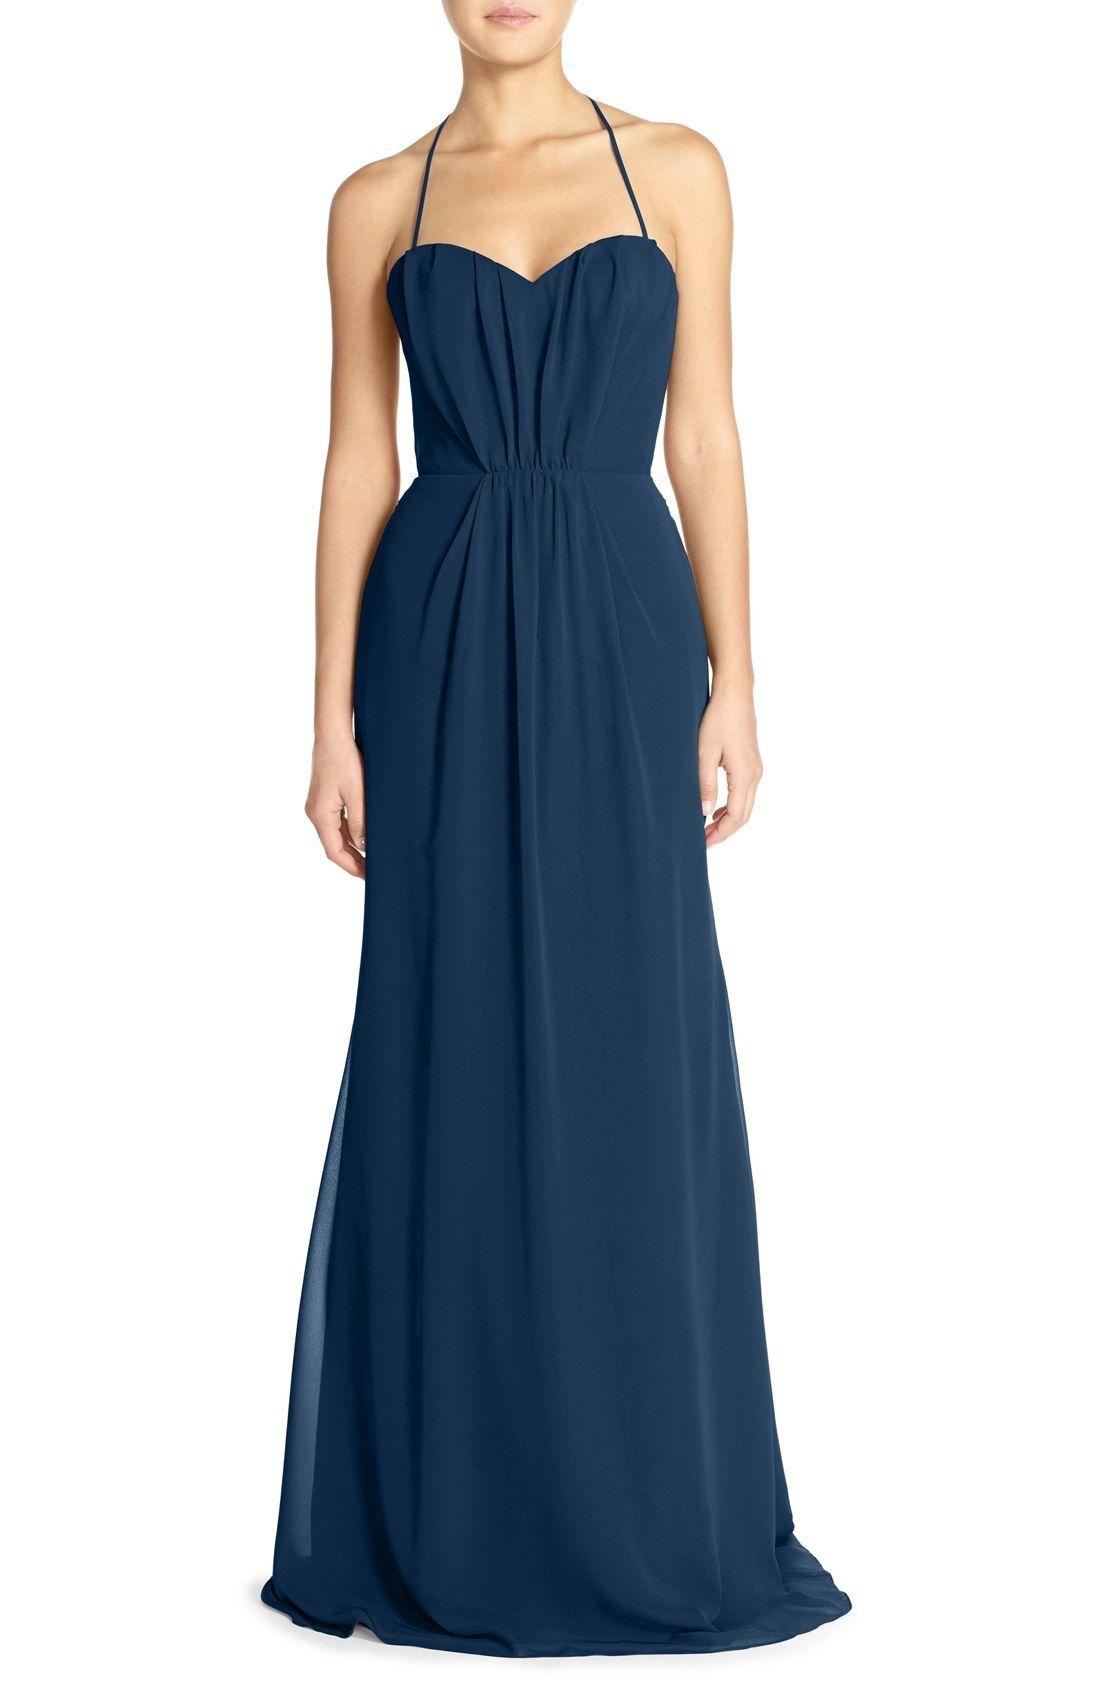 e6196fce3ef Chiffon Navy Blue Bridesmaids Dresses